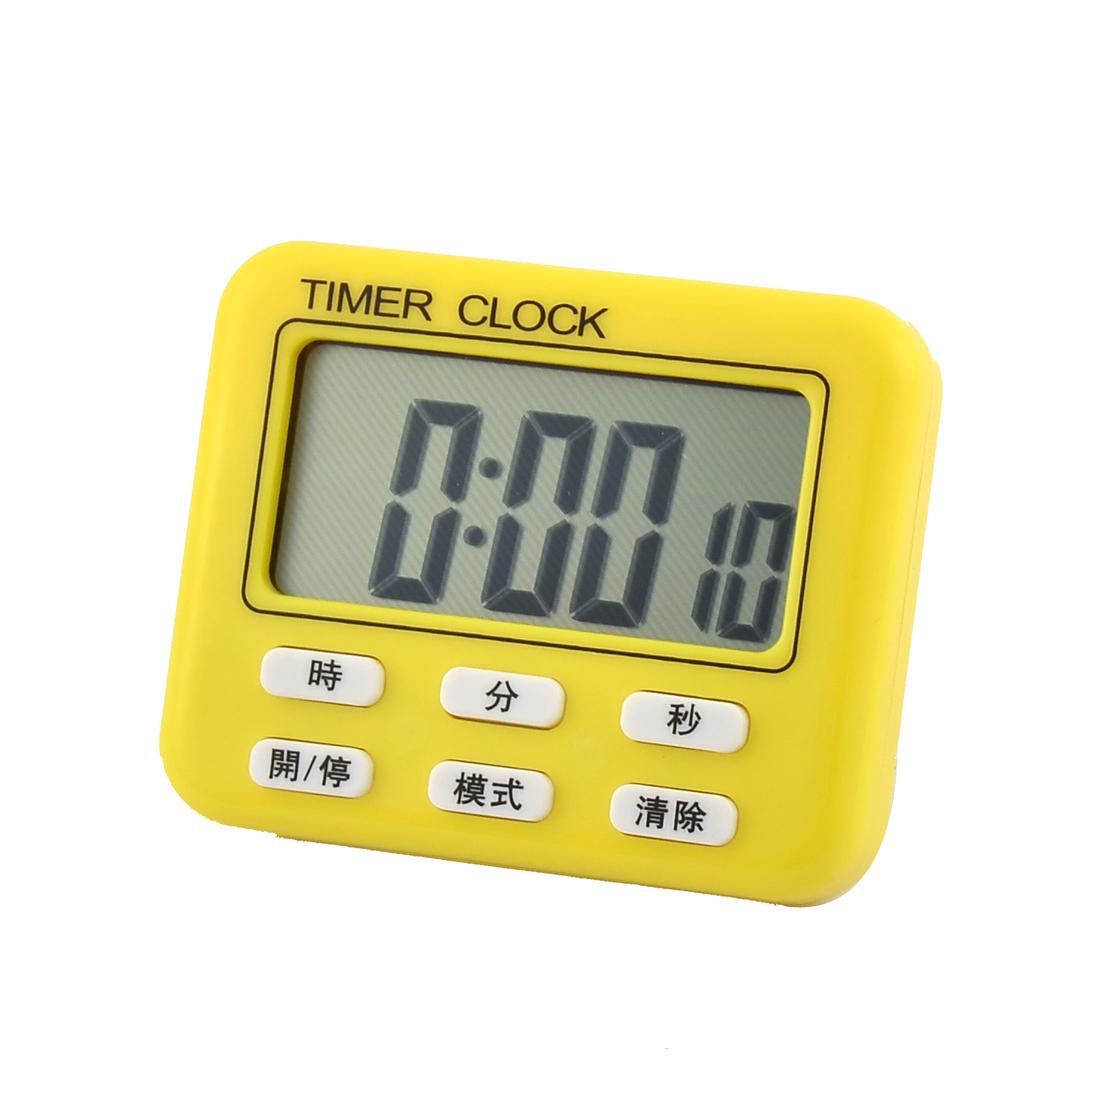 Timer Anywhere Digital